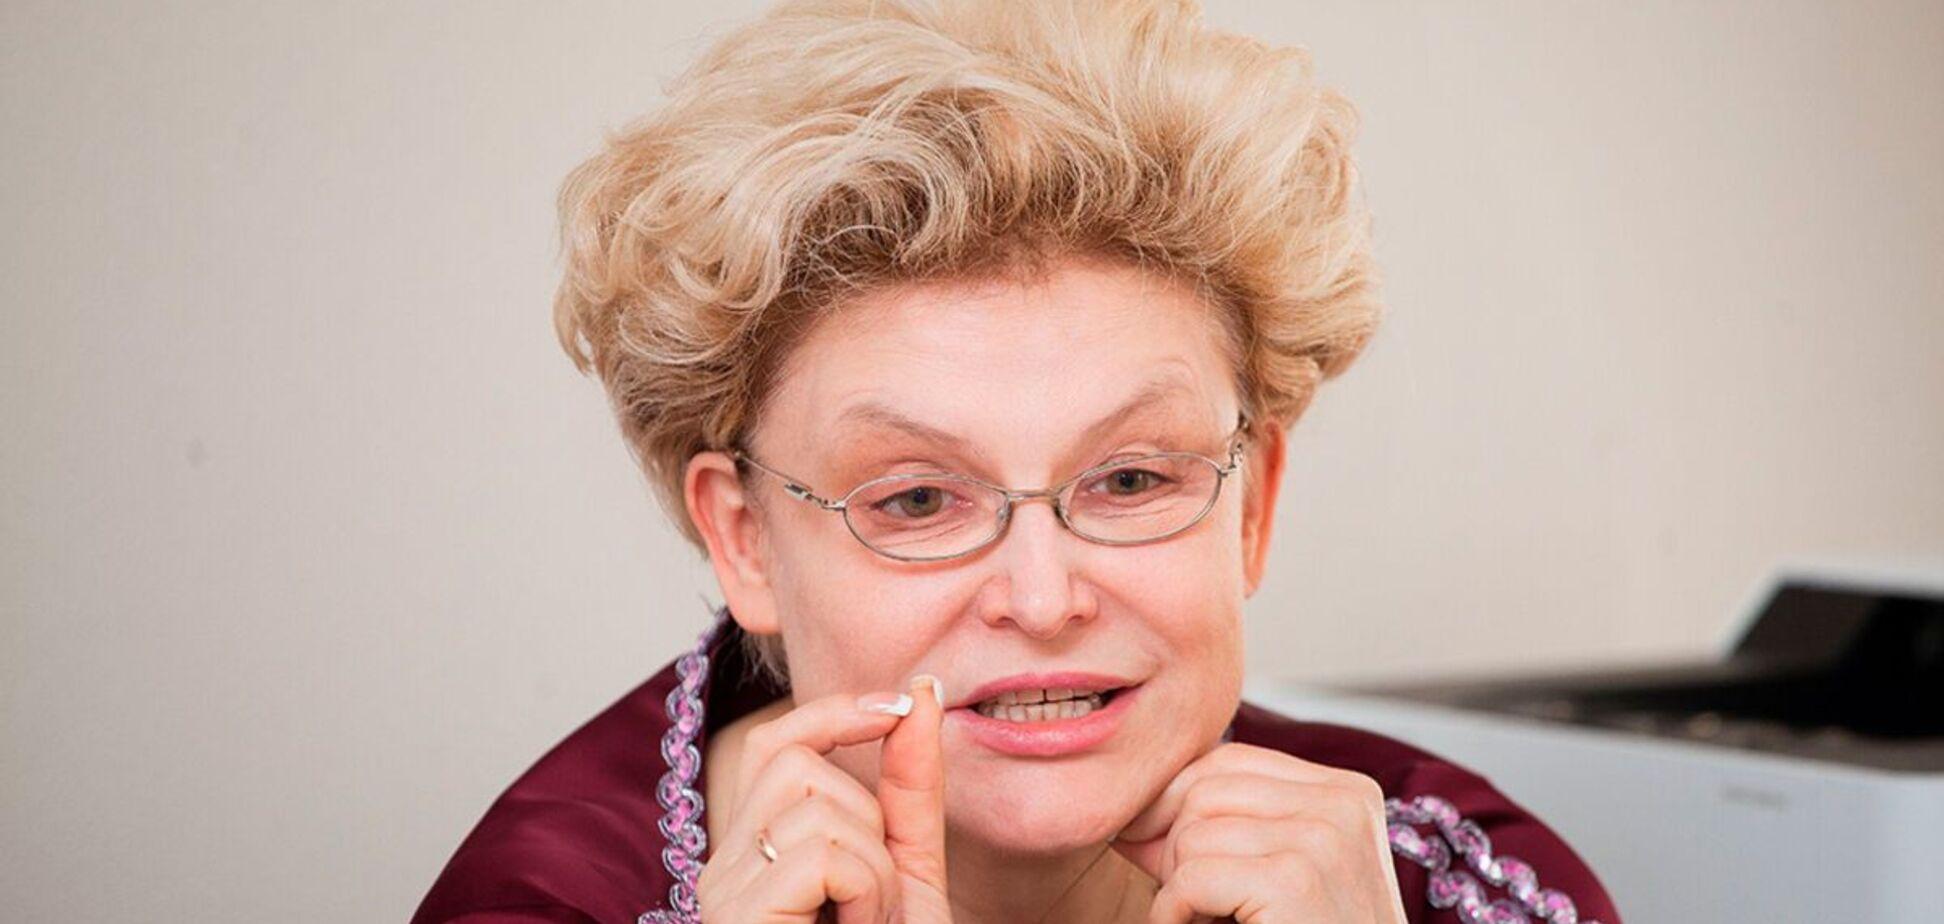 Елена Малышева выразила 'огромную благодарность' коронавирусу